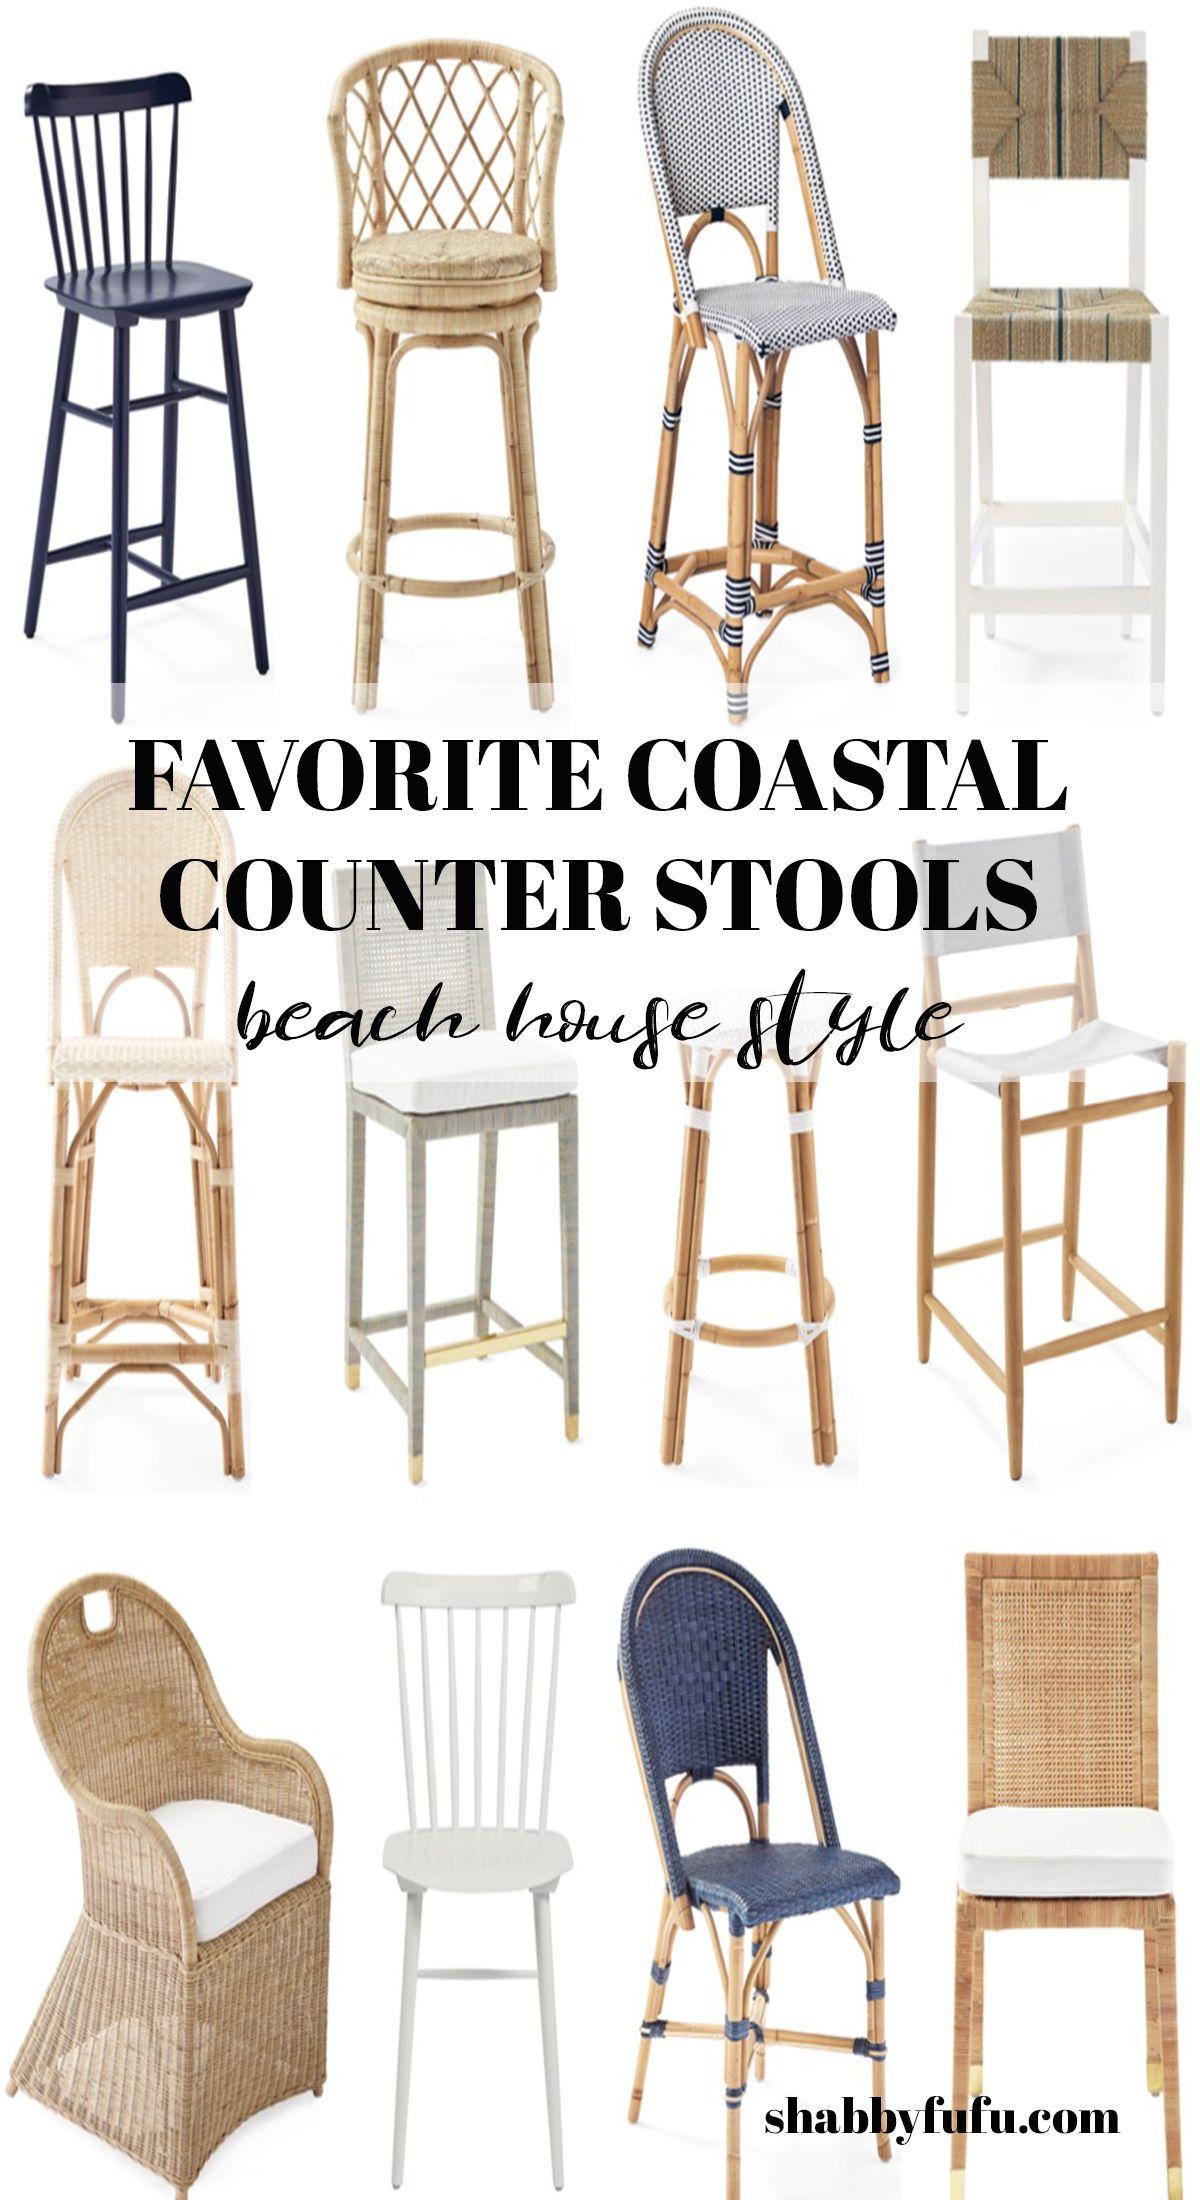 Coastal Decorating Favorites New Counter Stools Counter Stools Decor Affordable Home Decor